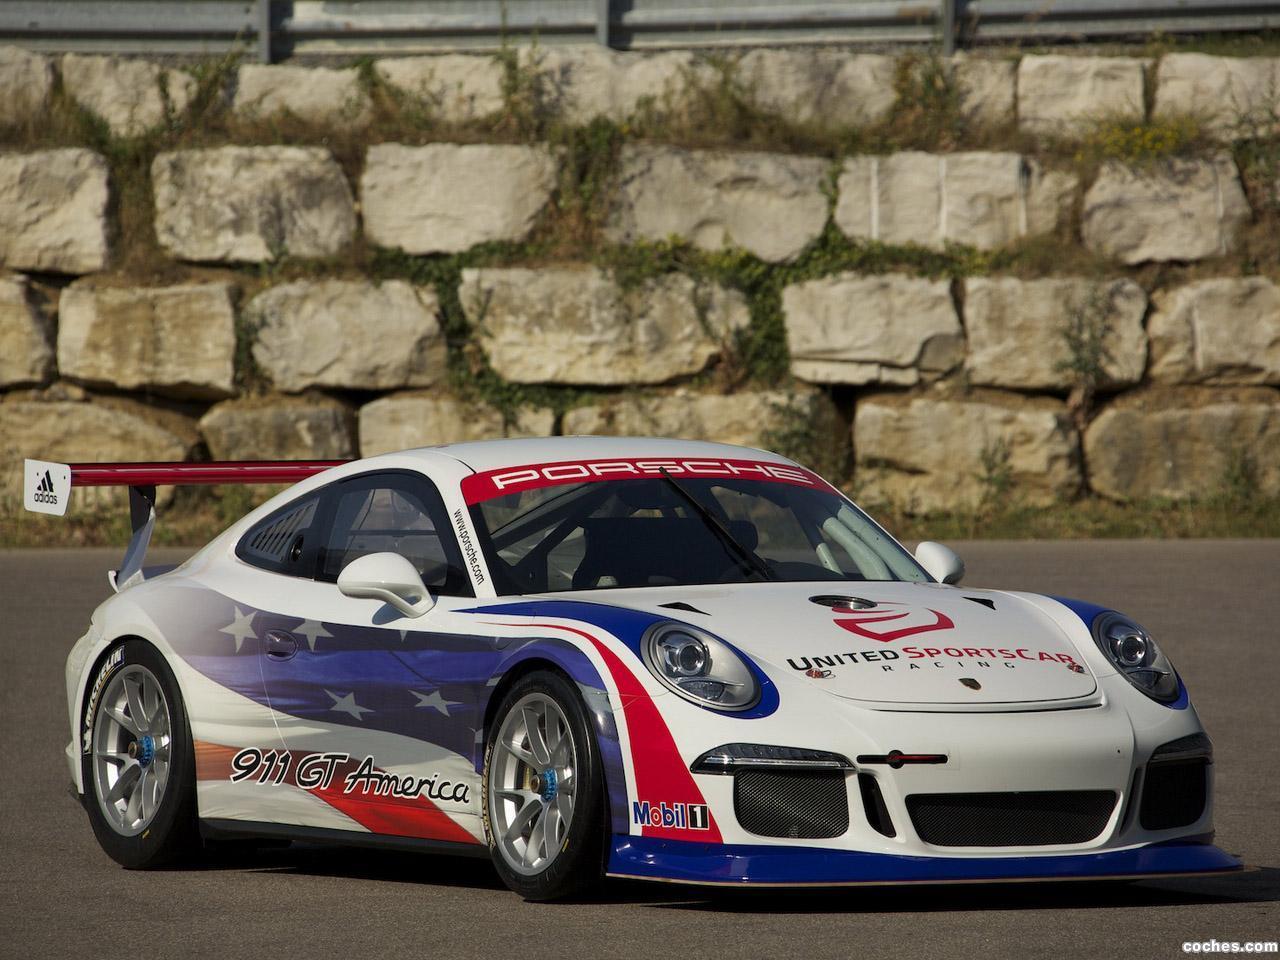 Foto 0 de Porsche 911 GT America 991 2013